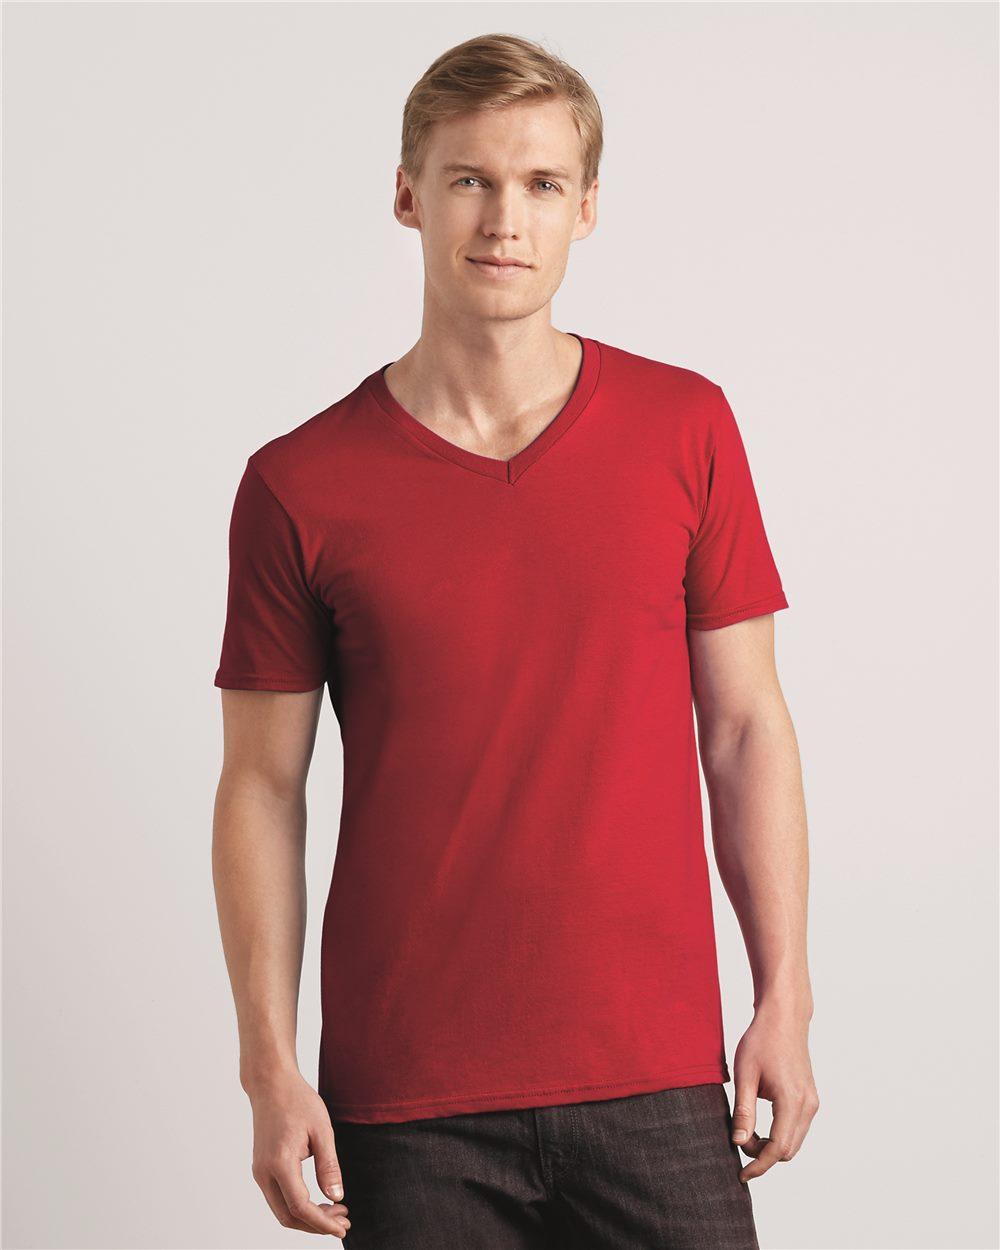 0b2b43ad6e G64V Gildan 4.5 oz SoftStyle V Neck T Shirt > T-Shirts